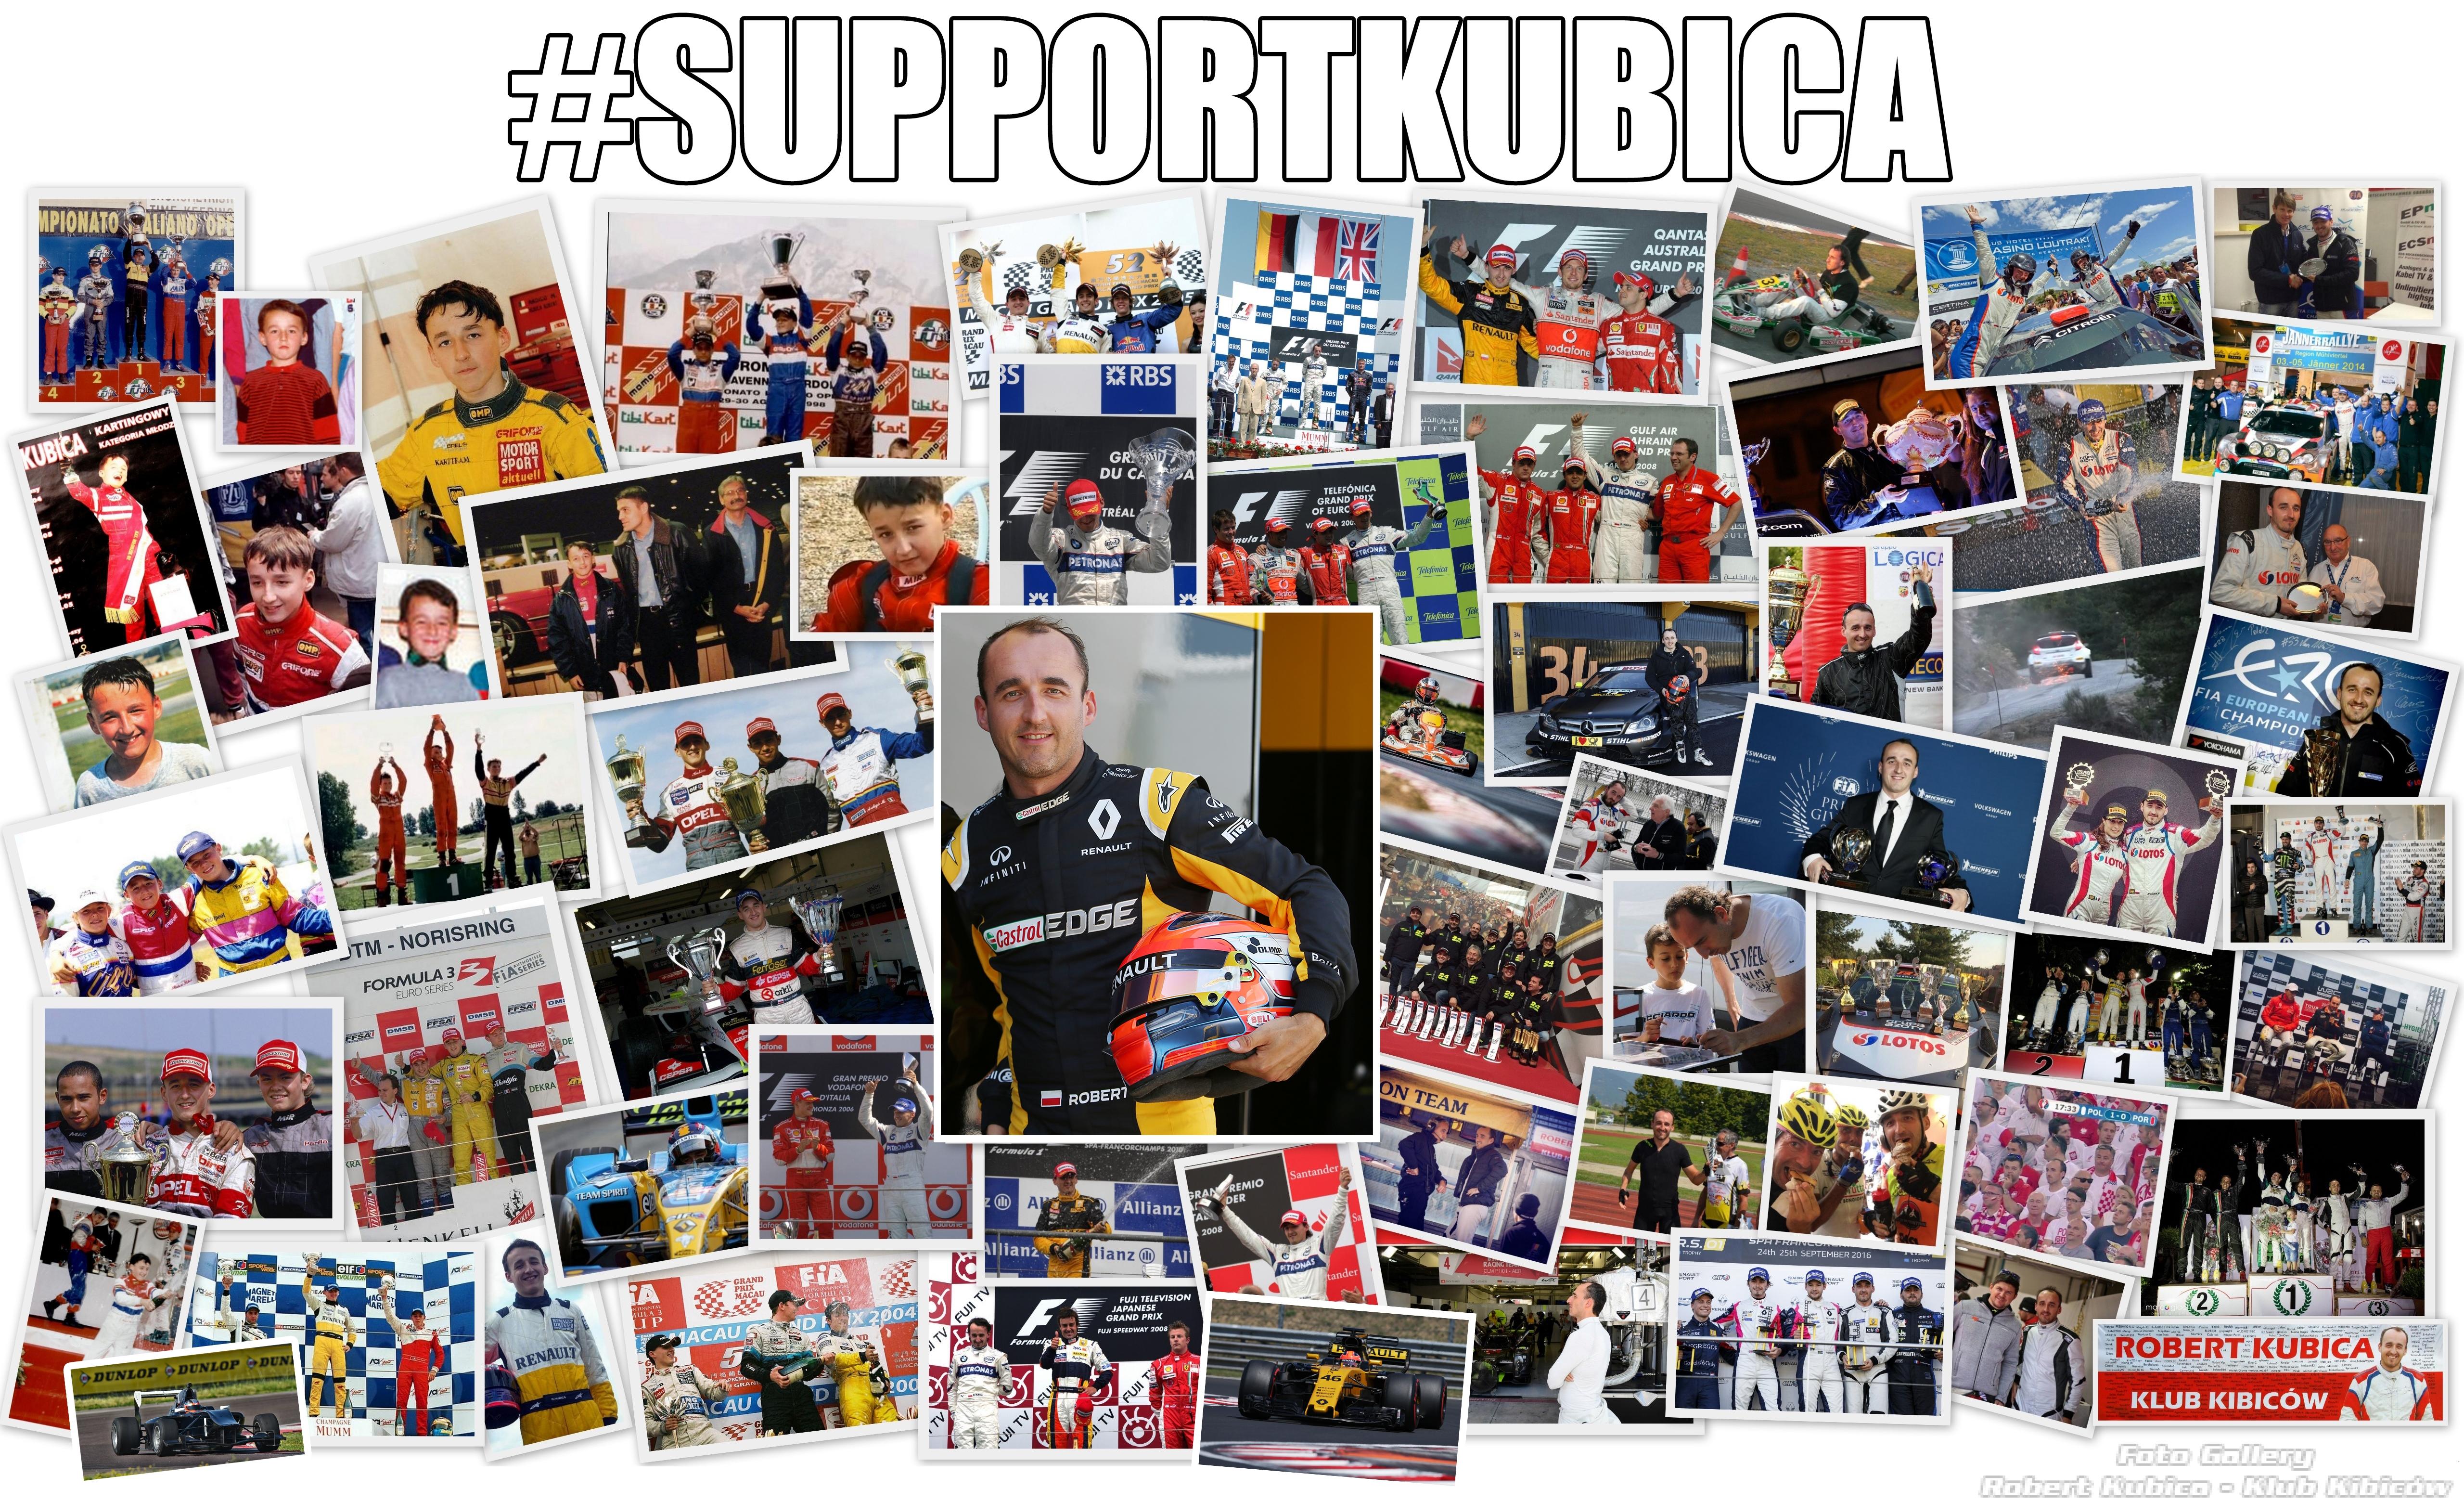 SupportKubica - Robert Kubica Klub Kibiców